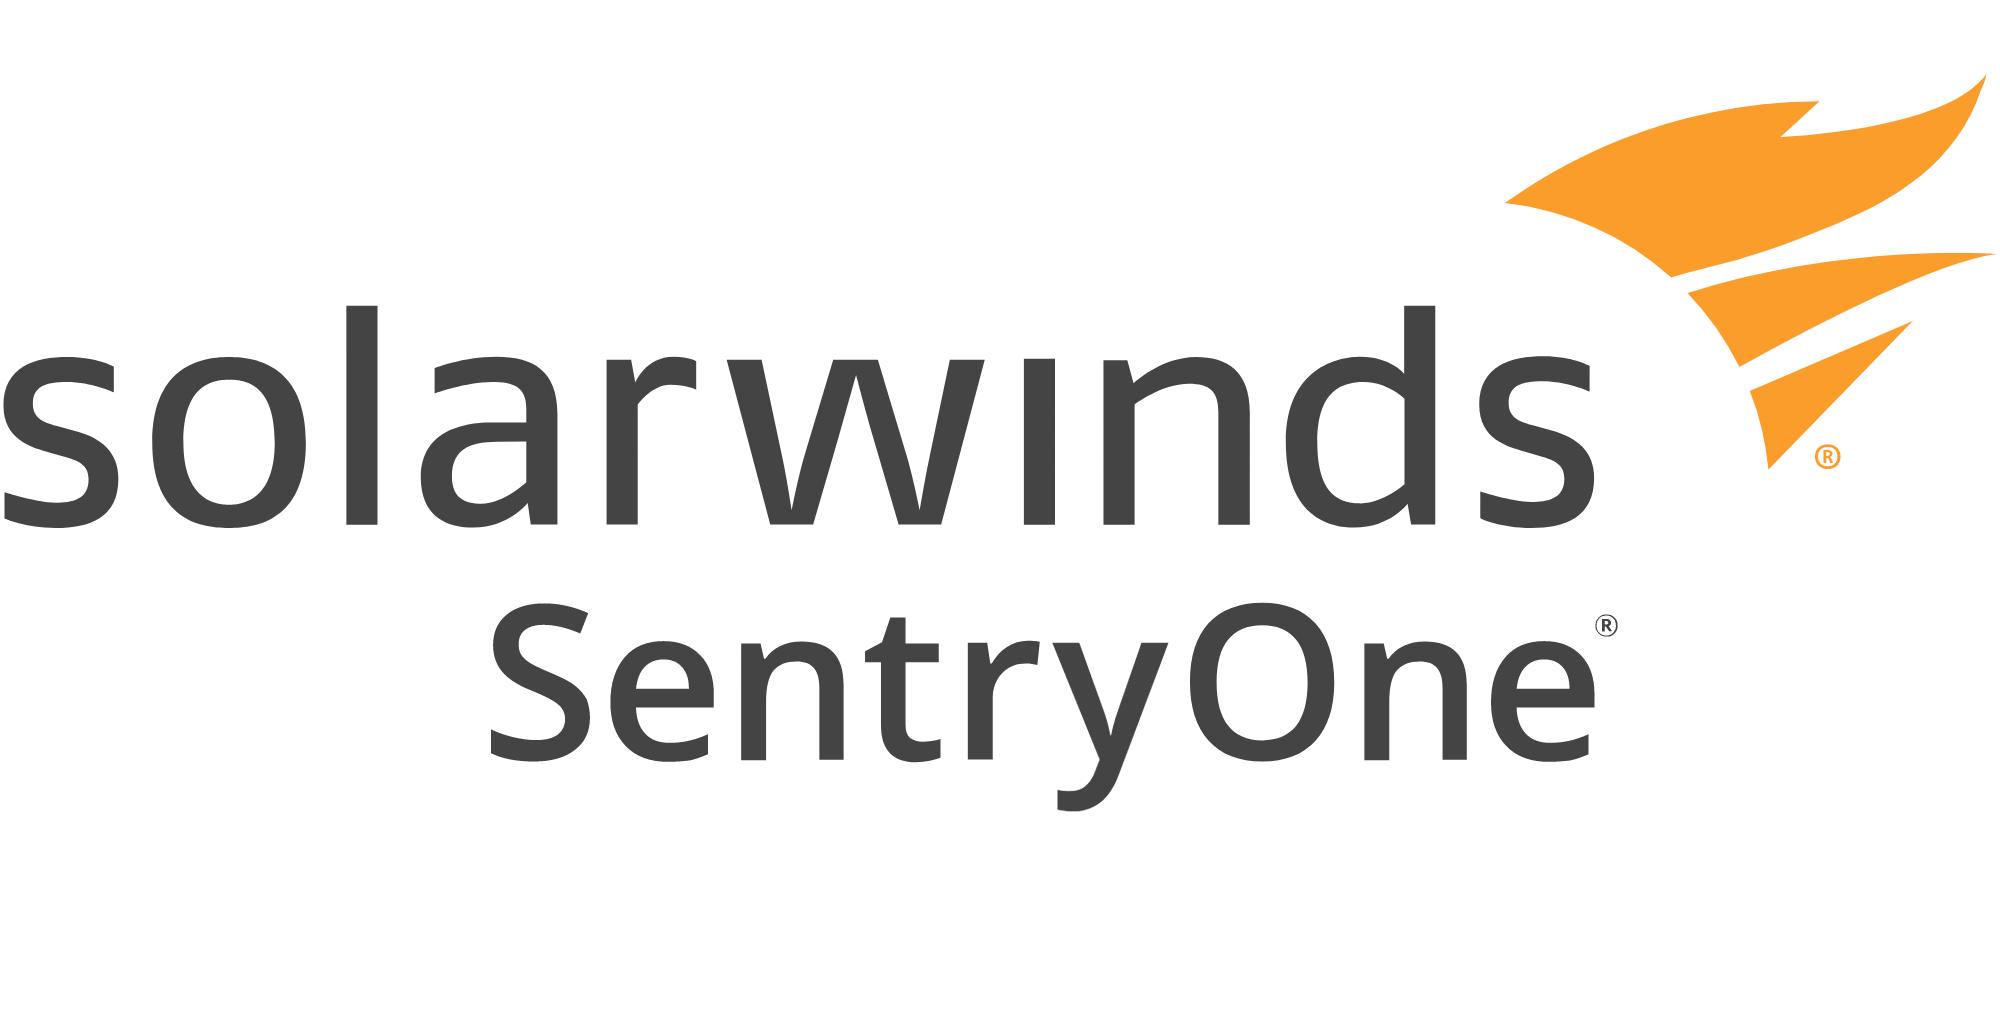 solarwinds-sentryone-logo